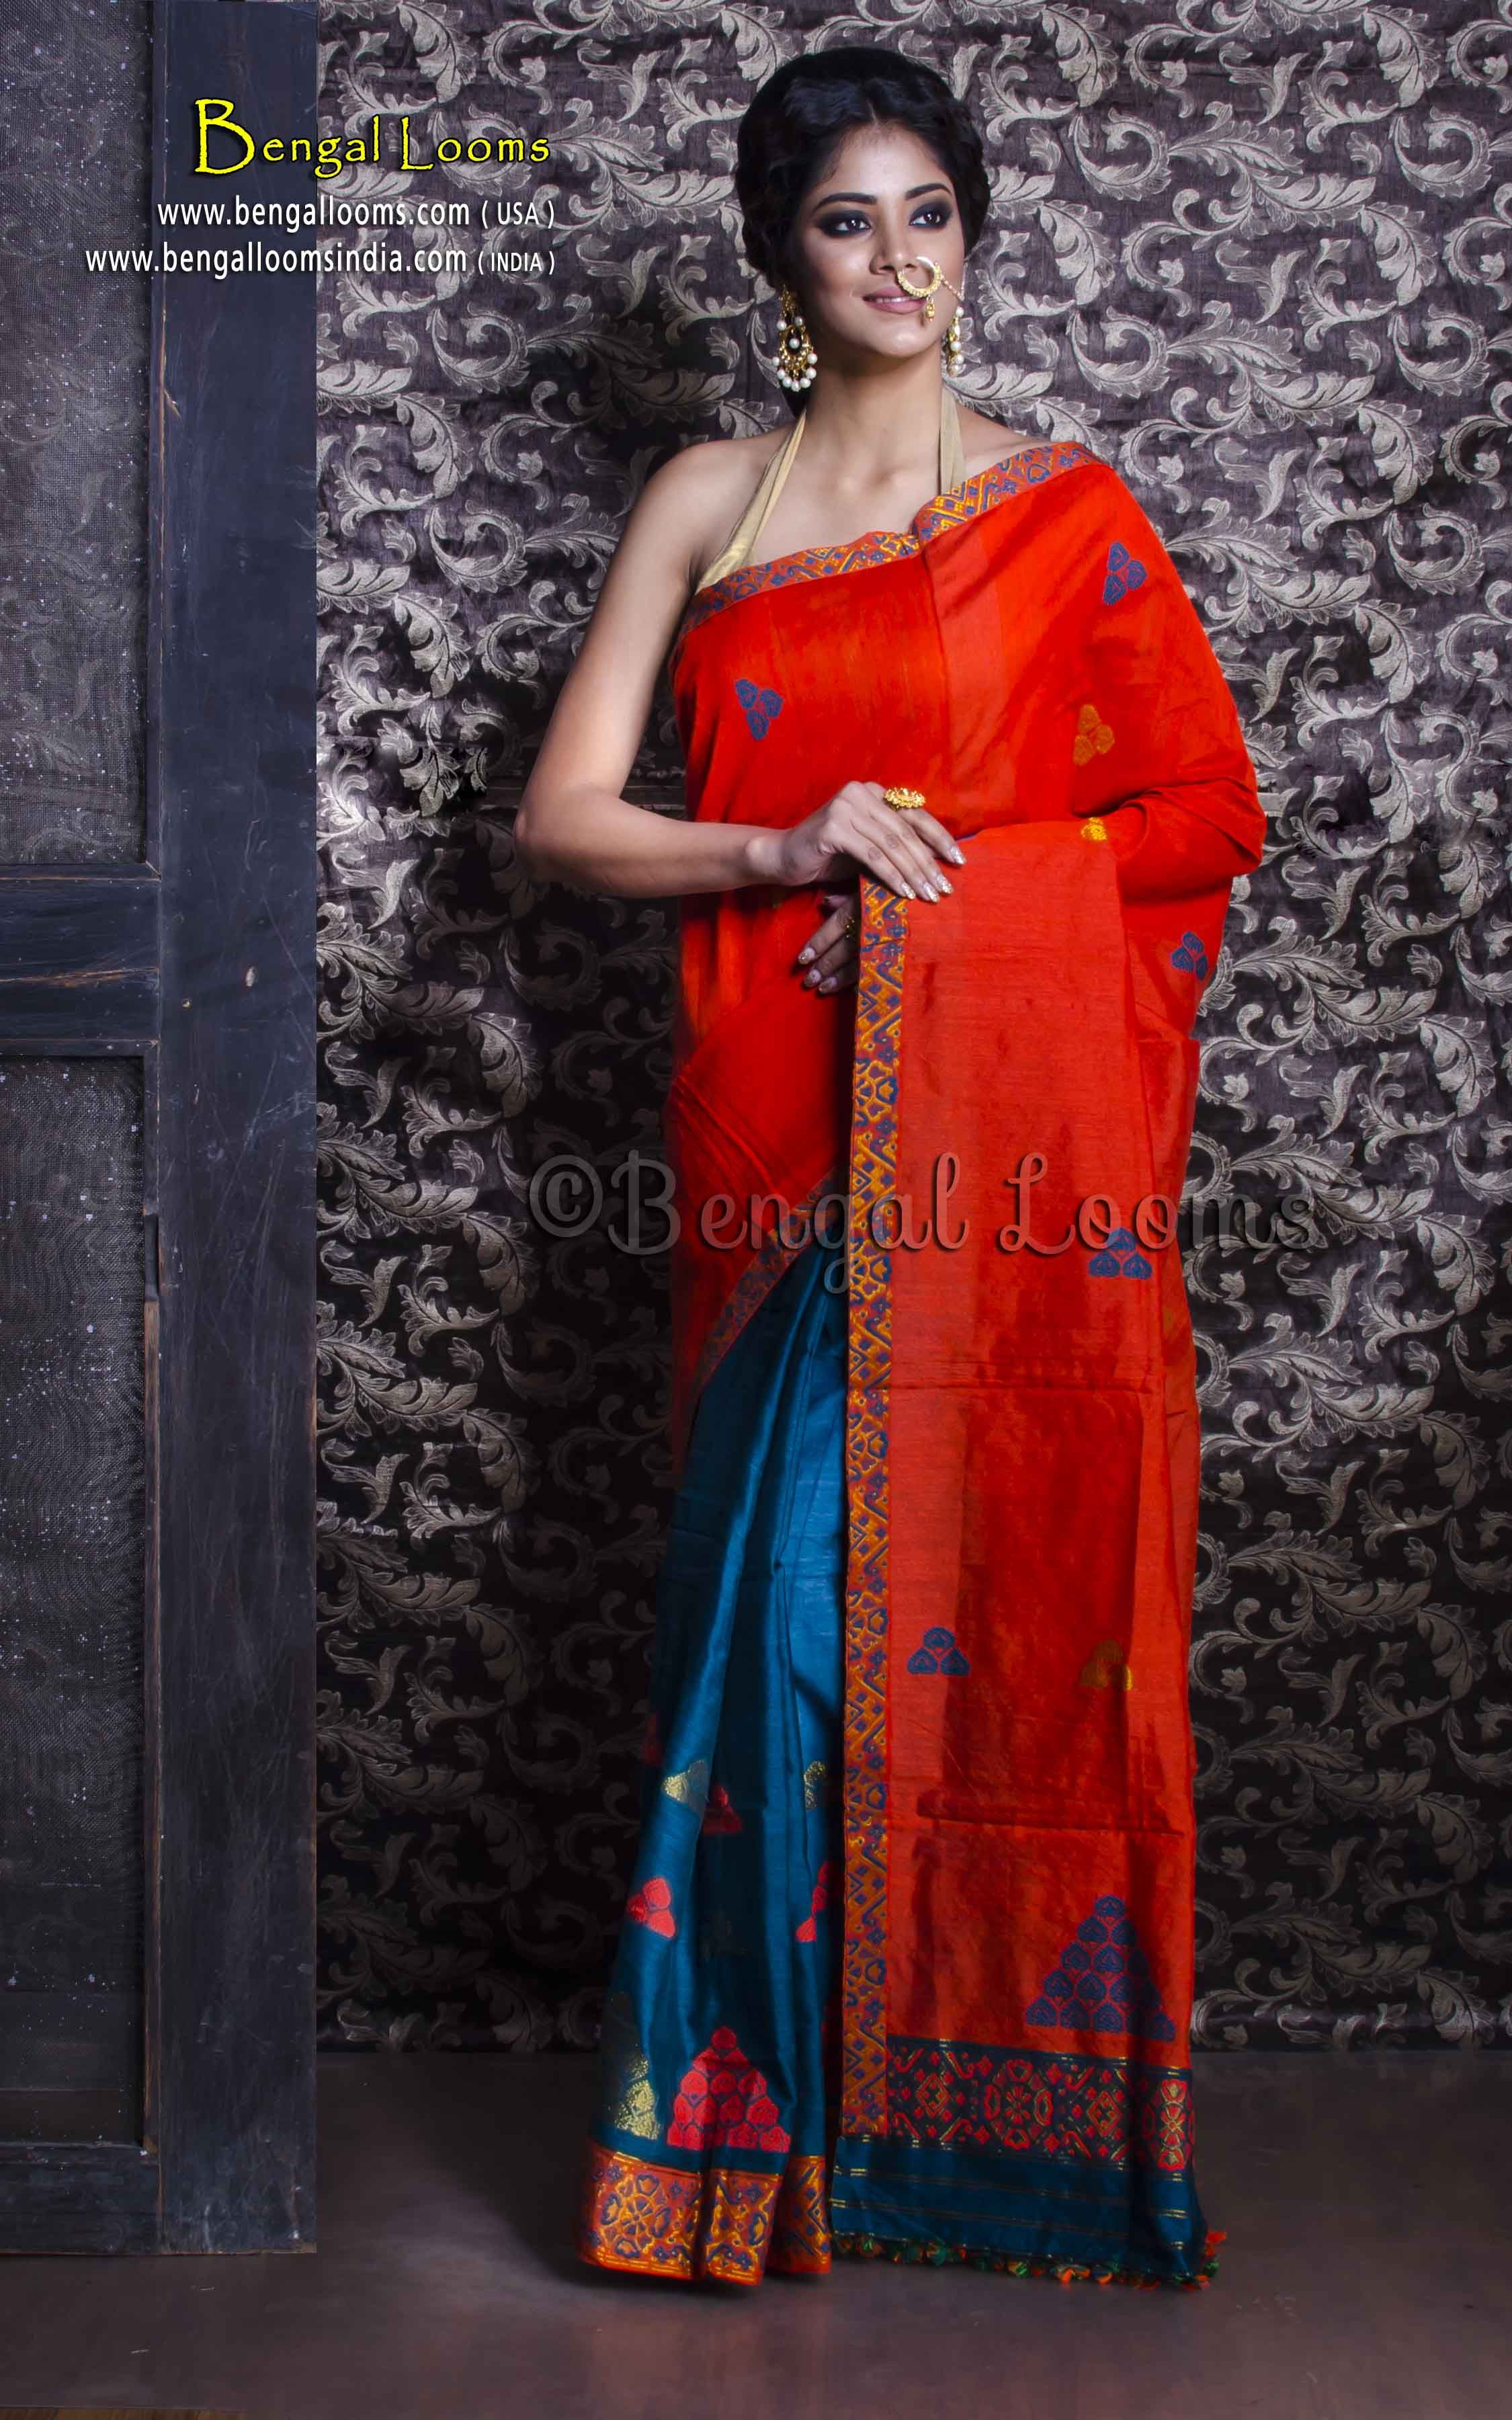 Look - How to mekhla wear chadar video